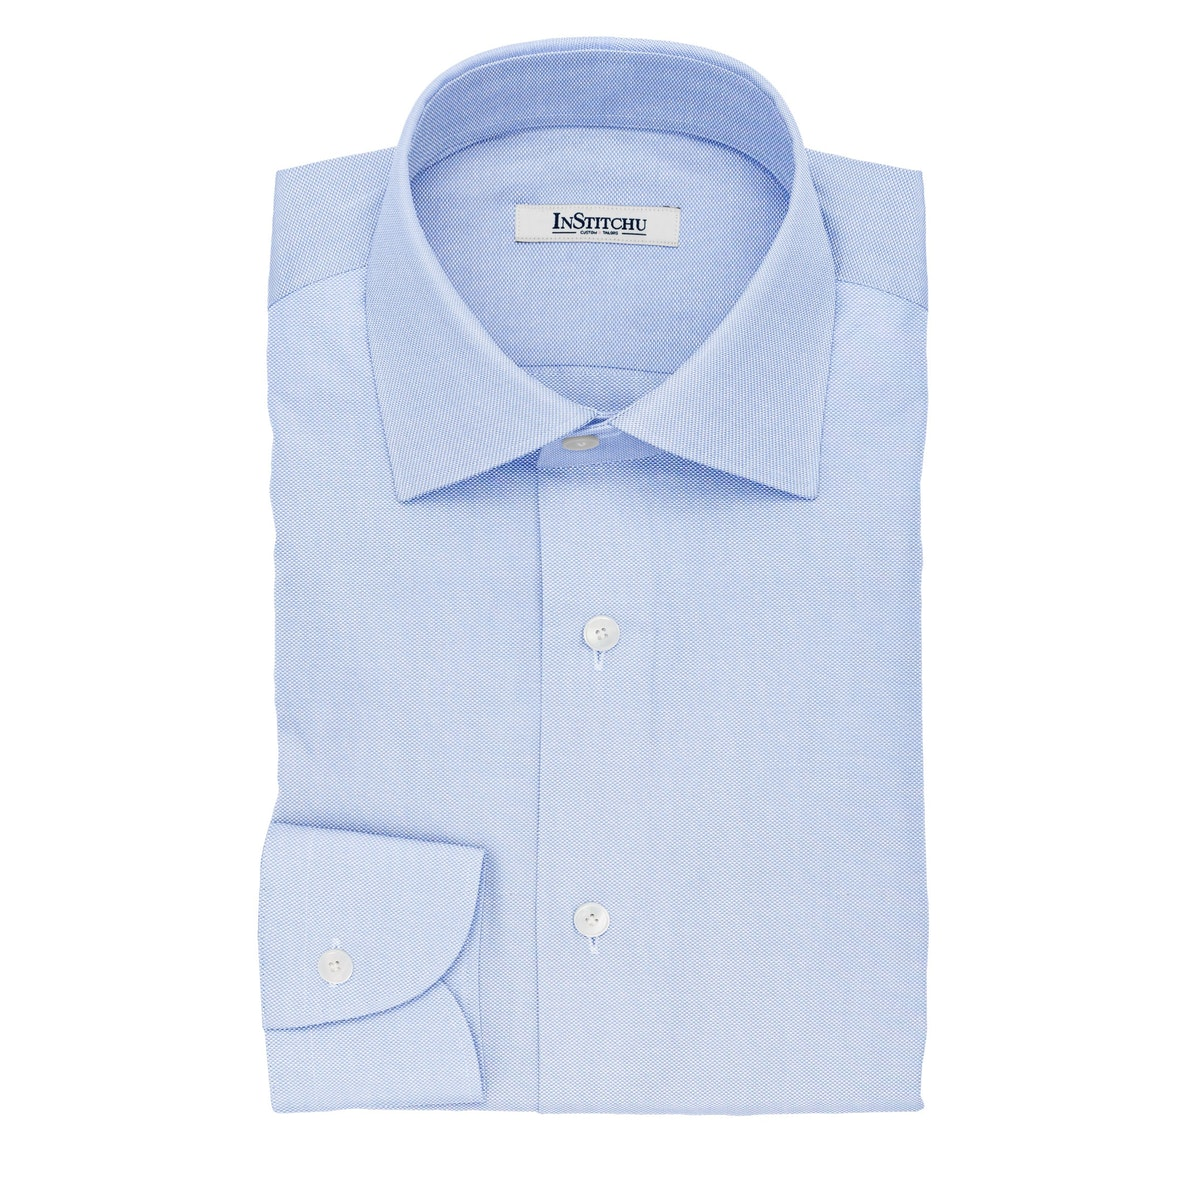 InStitchu Collection The Carroll Blue Textured Cotton Shirt